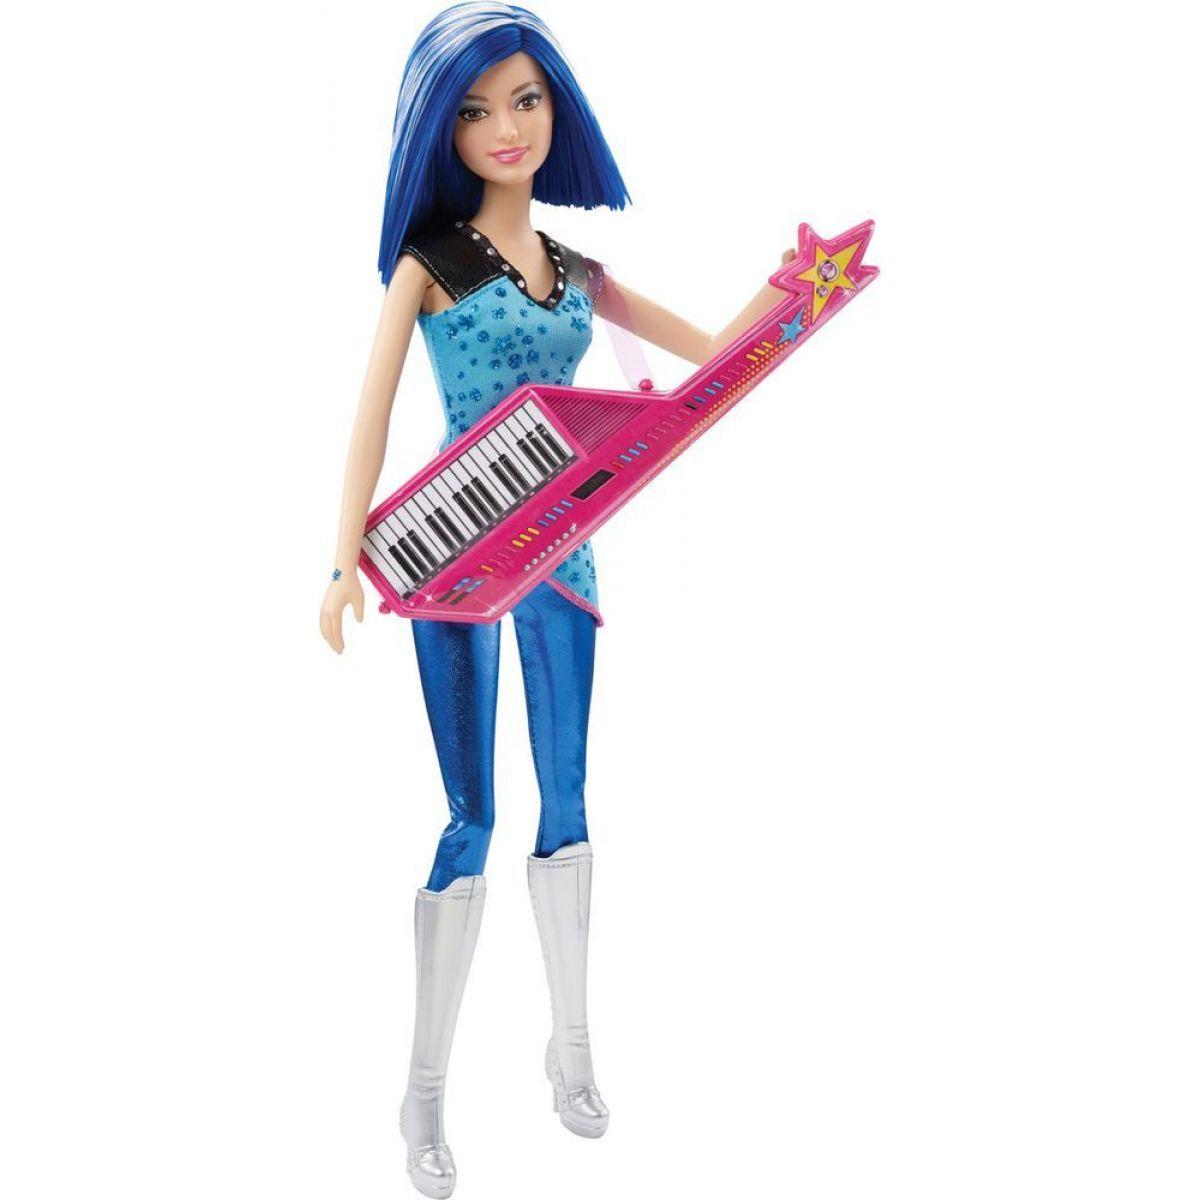 Barbie Rock N Royals - Rockerka